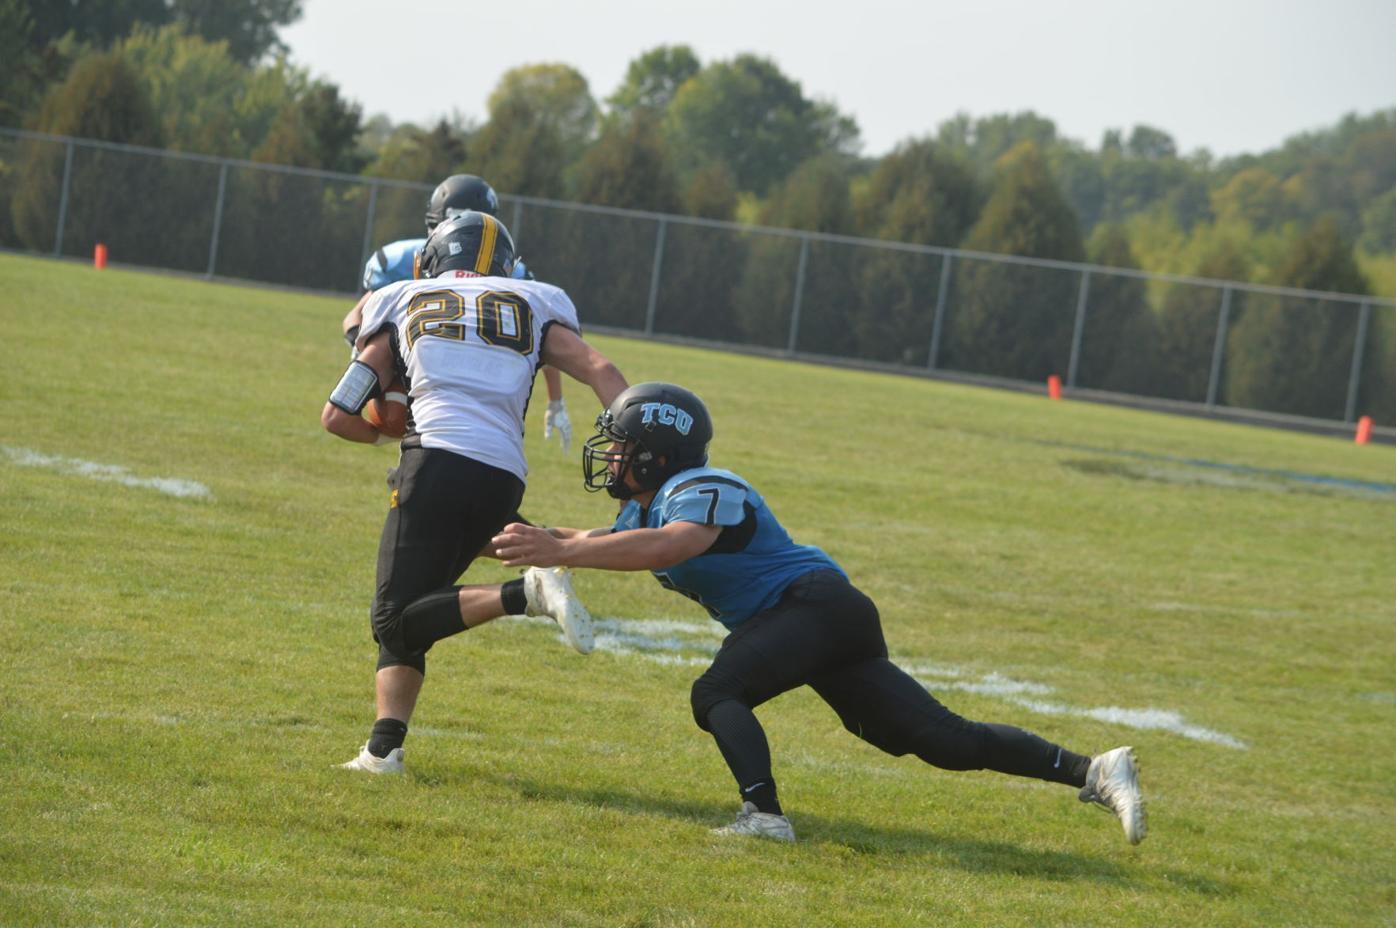 TCU football tackle